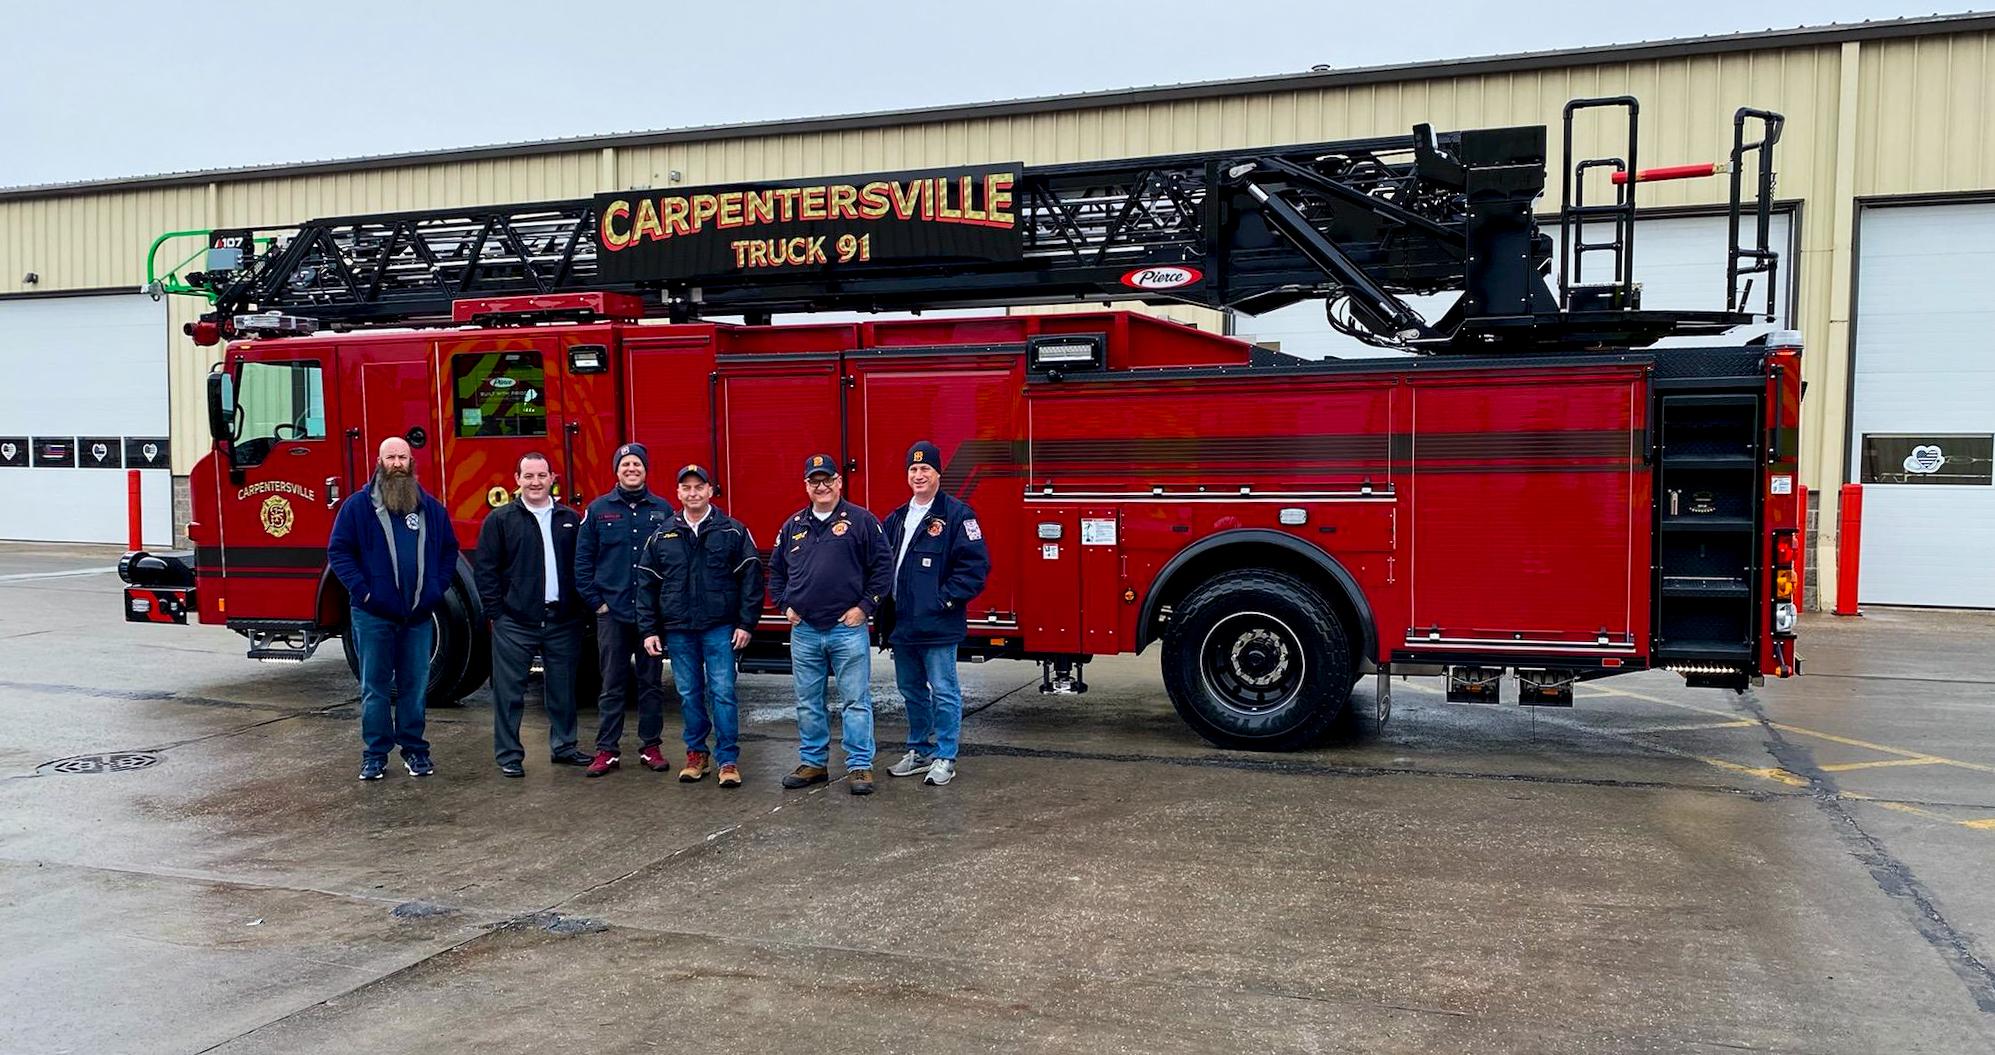 IMG_6451-2Carpentersville Fire Department - Aerial